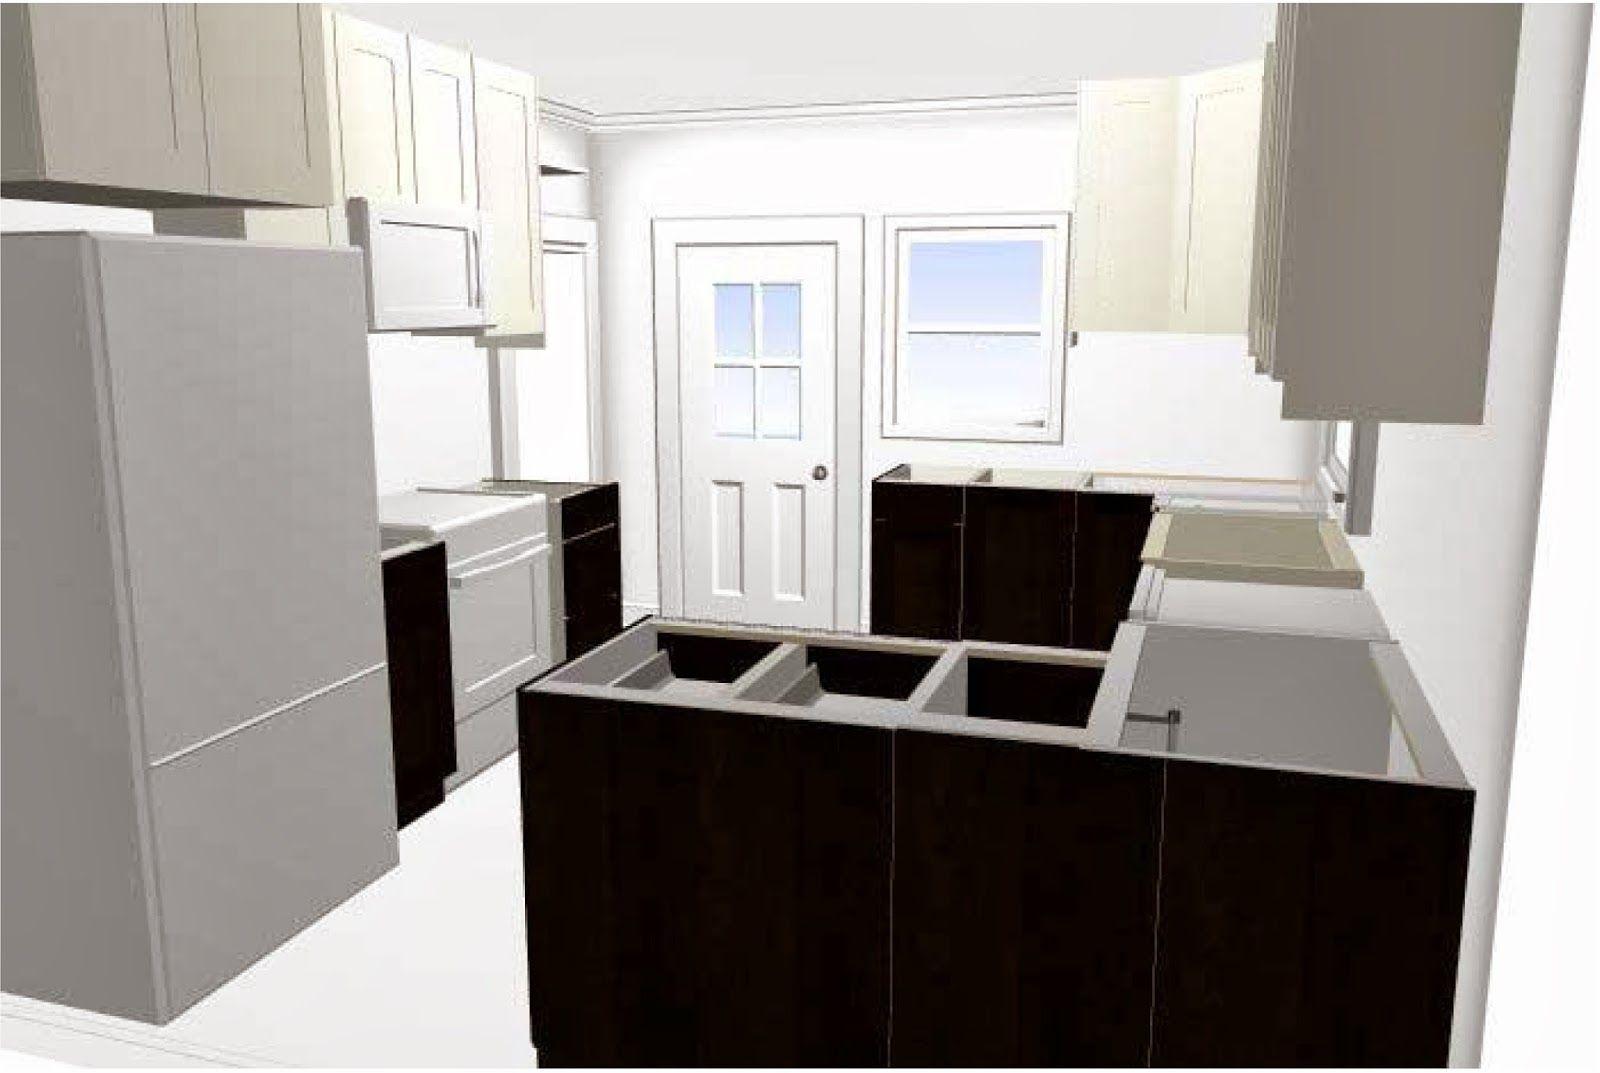 Two window kitchen design  danks and honey our ikea kitchen  design phase  kitchen ideas